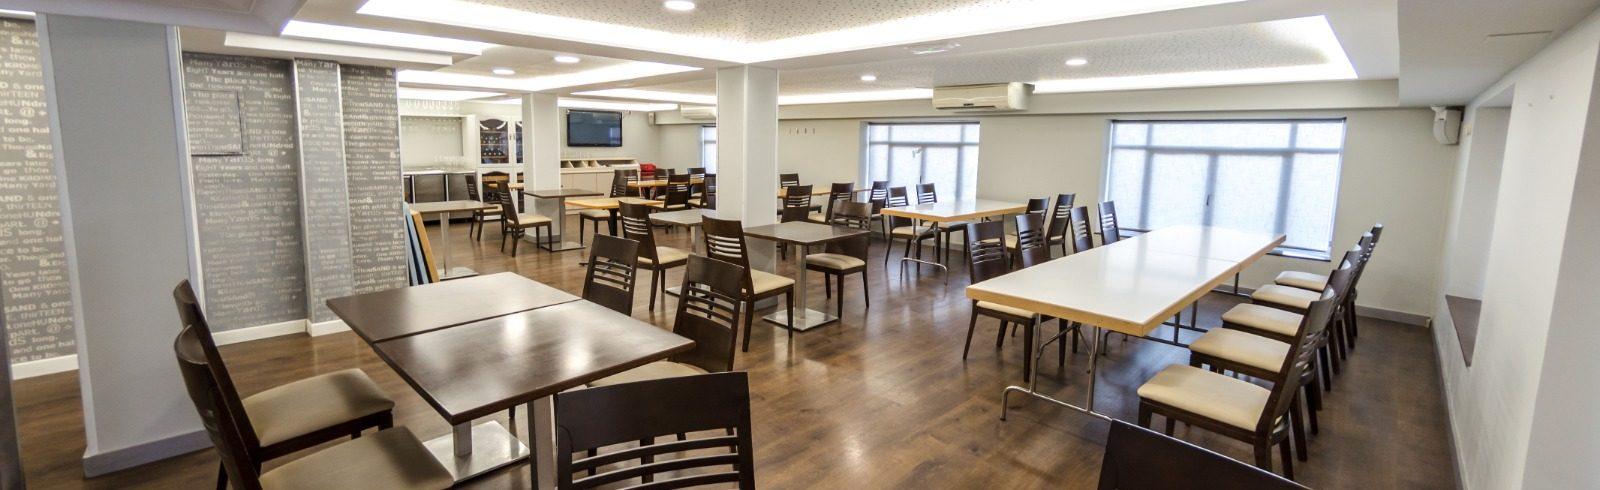 oasis zamora restaurante _hostal (3)